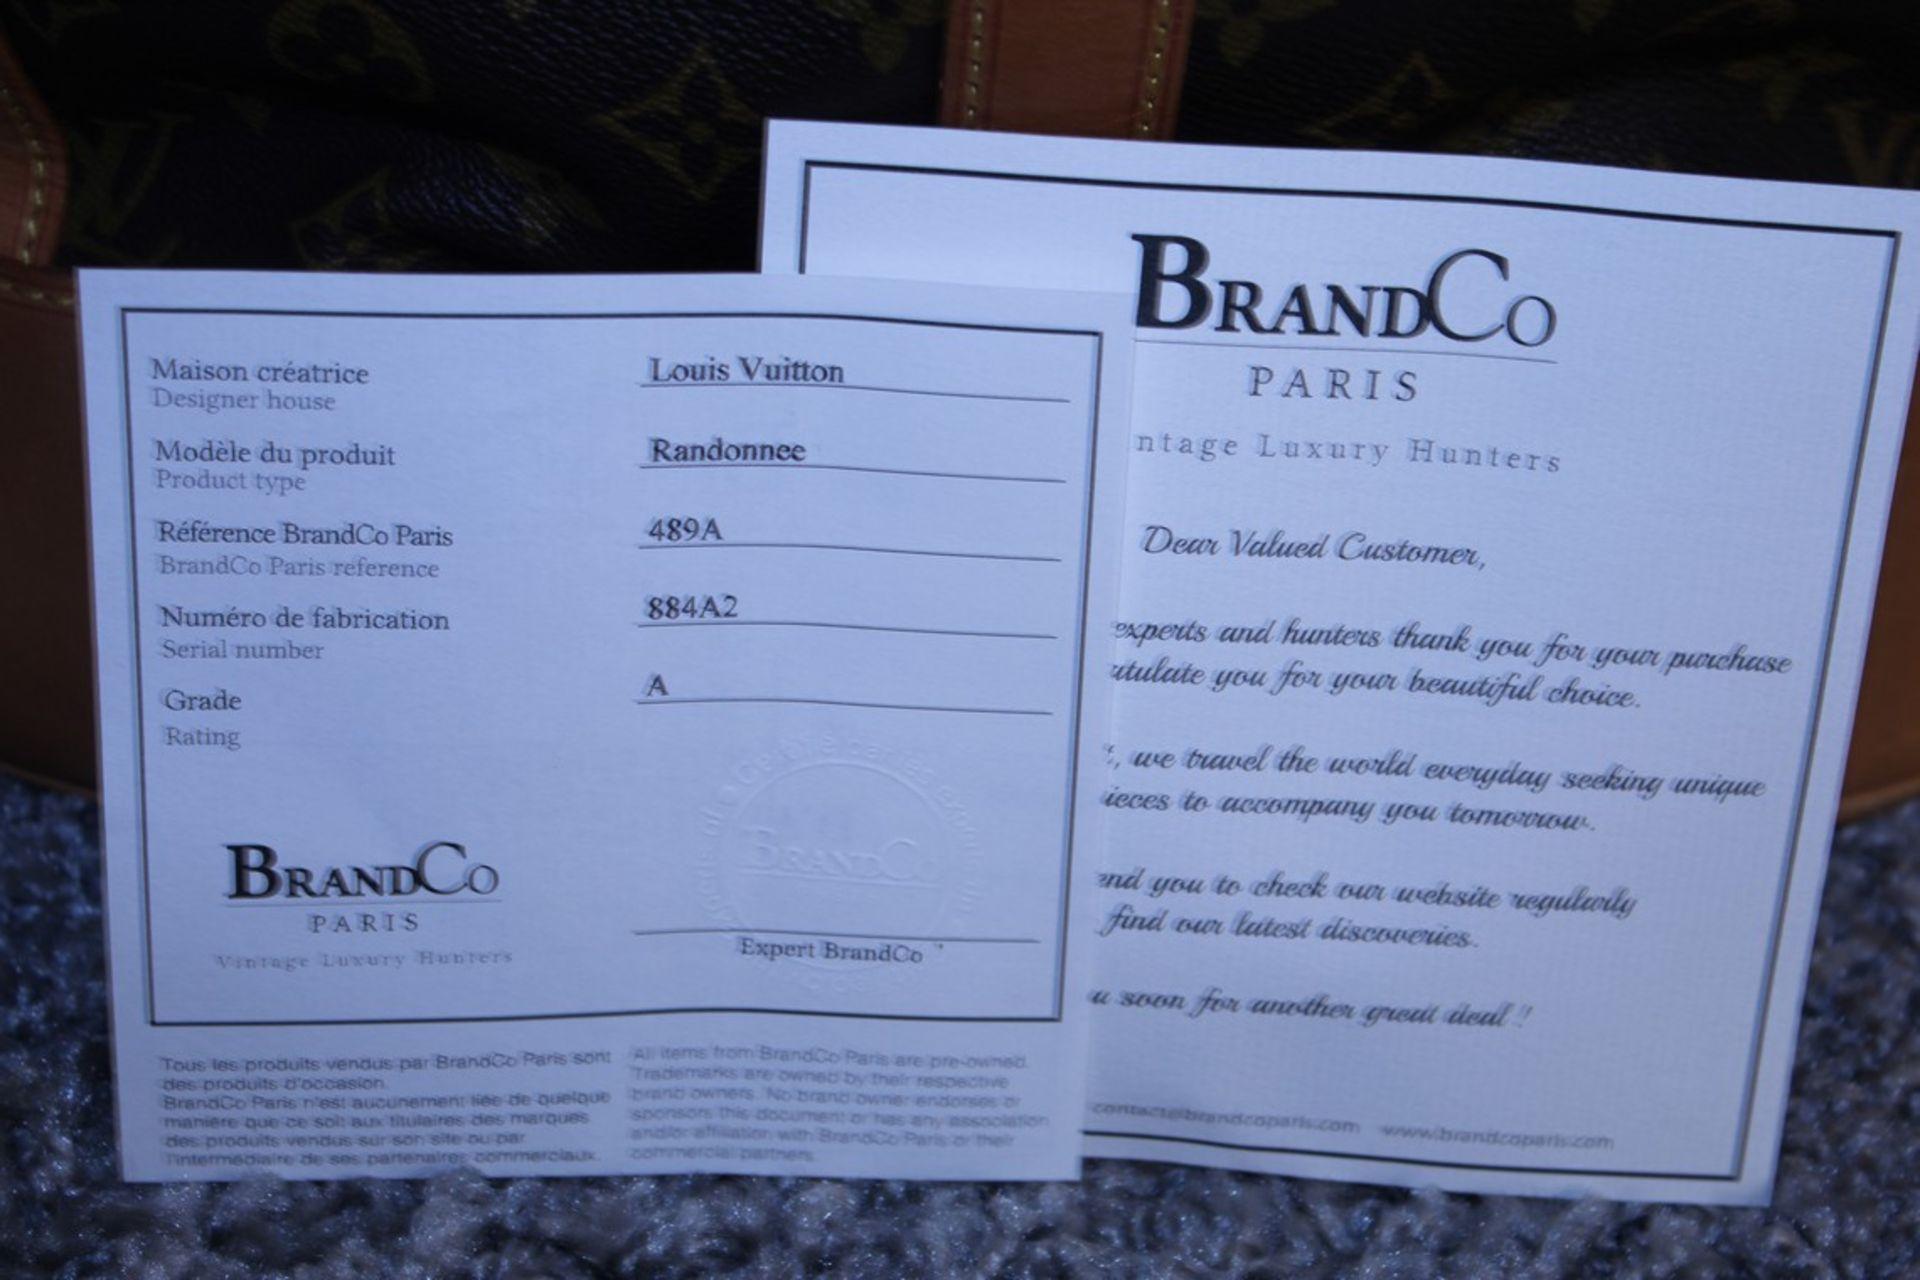 RRP £1,800 Louis Vuitton Randonnee Shoulder Bag, Brown Monogram Coated Canvas, Vachetta Handles, ( - Image 4 of 4